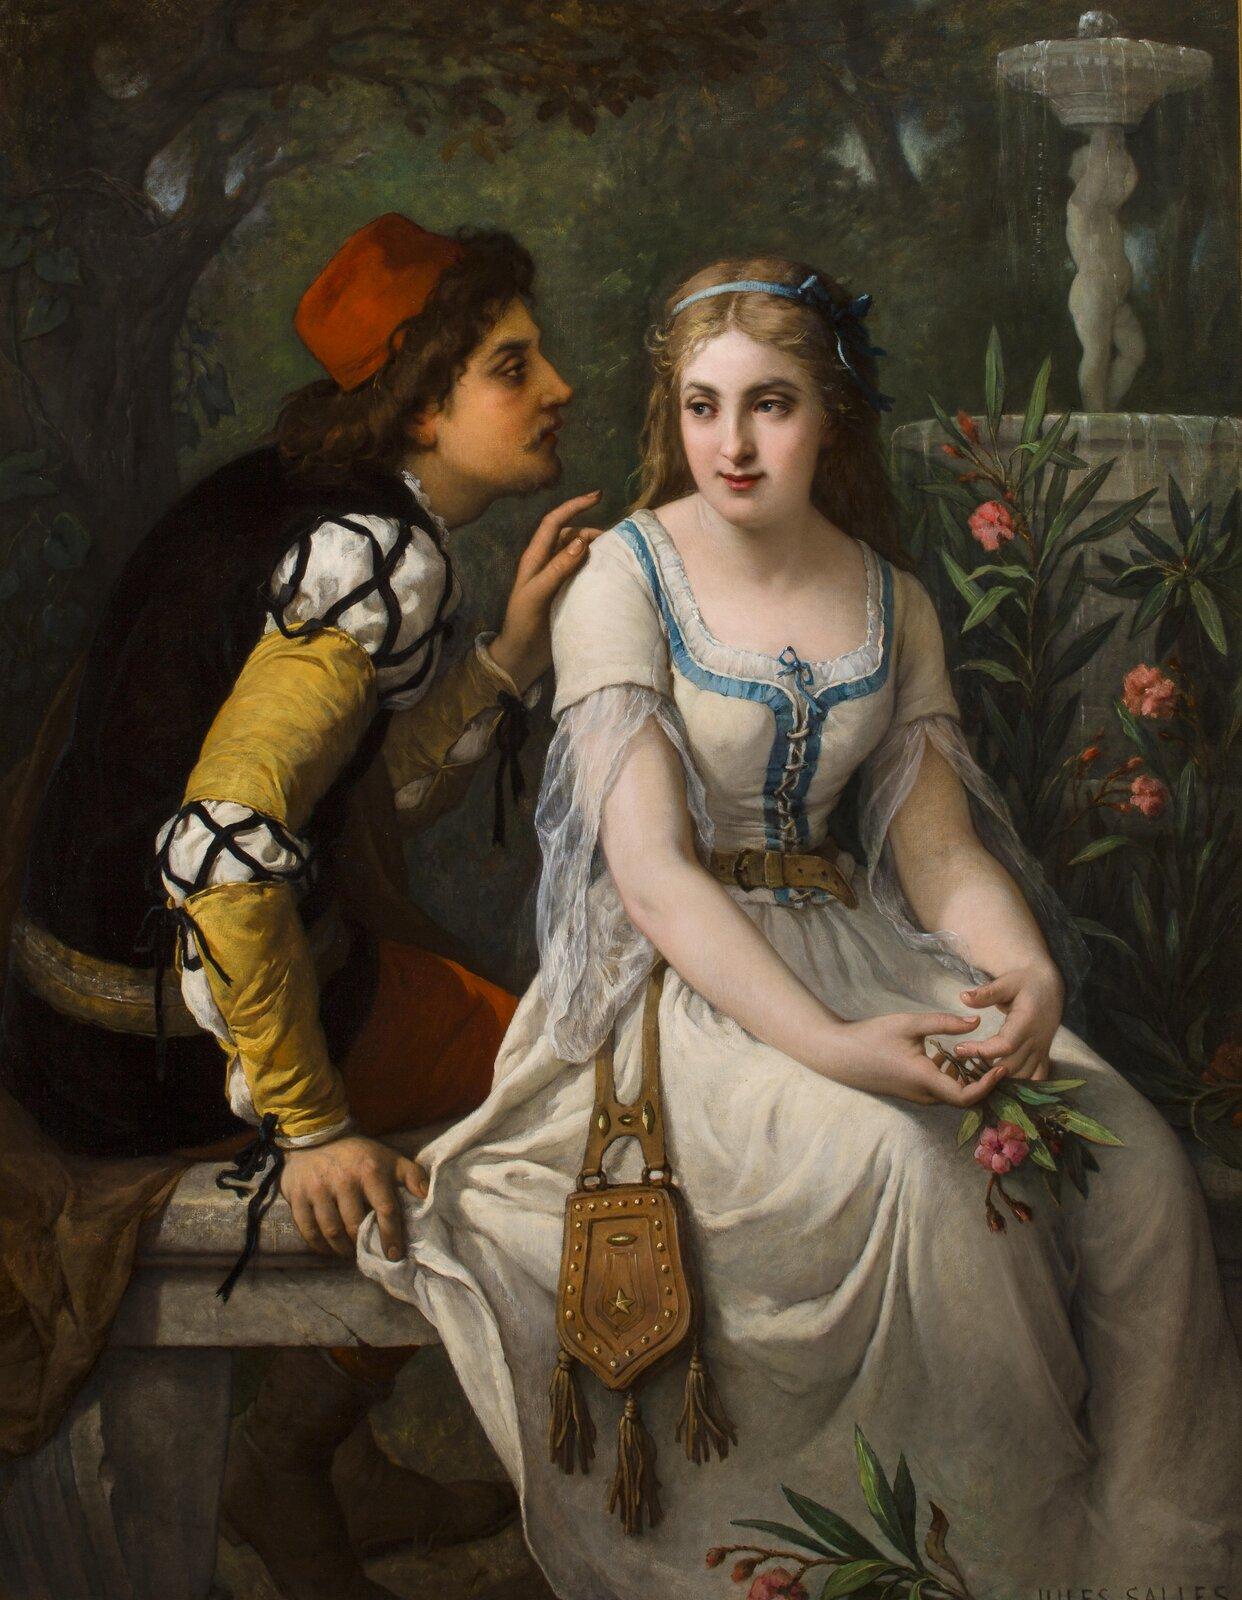 Romeo iJulia Źródło: Jules Salles-Wagner, Romeo iJulia, ok. 1898, olej na płótnie.